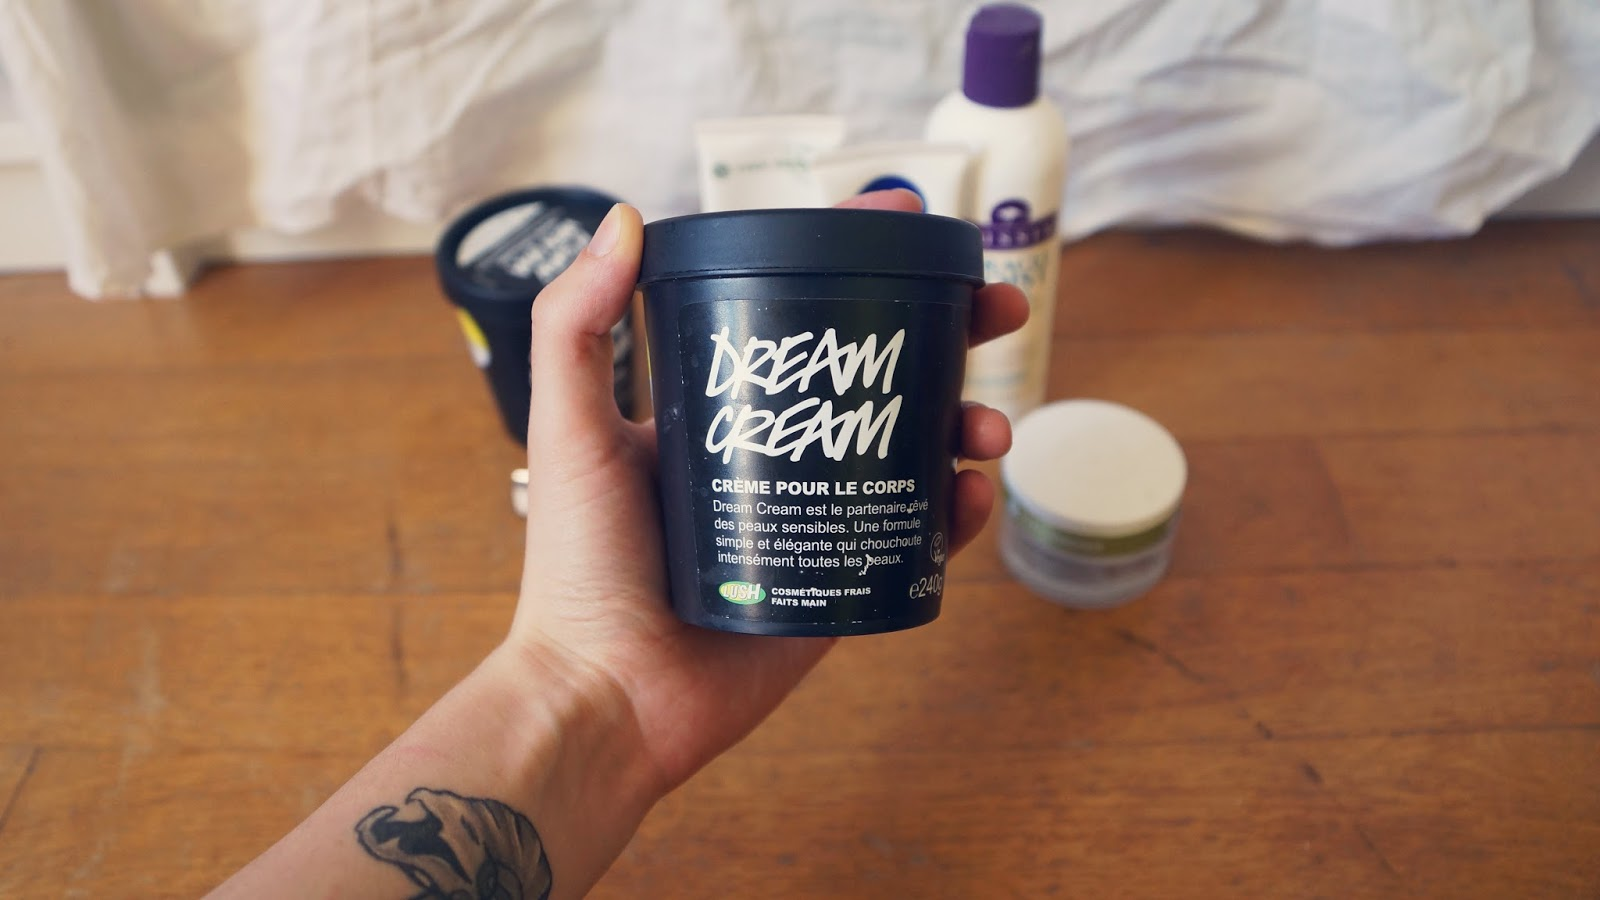 Lush Dream Cream Body Cream Review